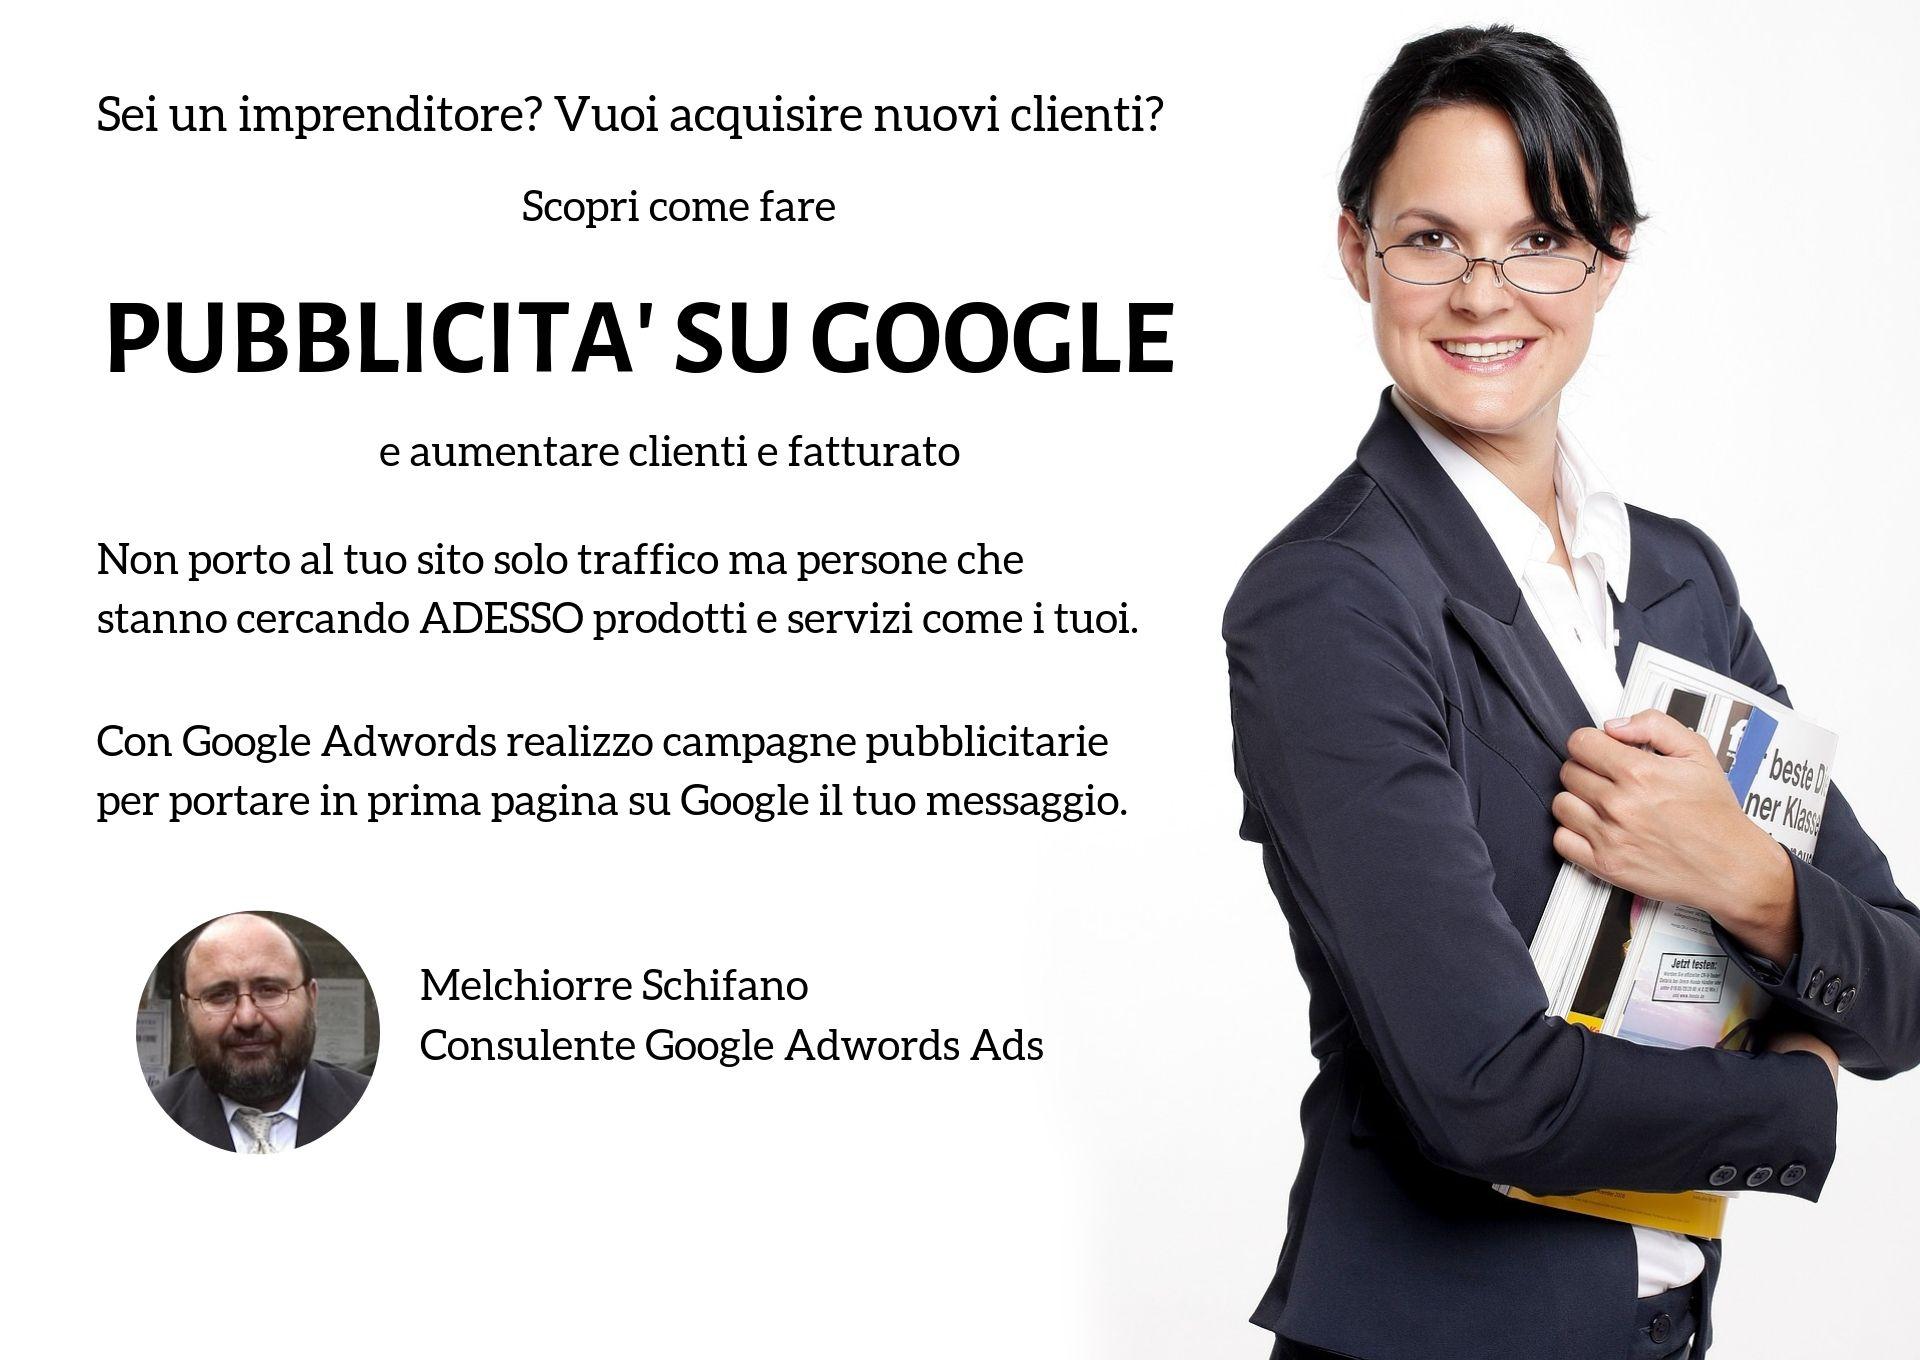 pubblicita su google